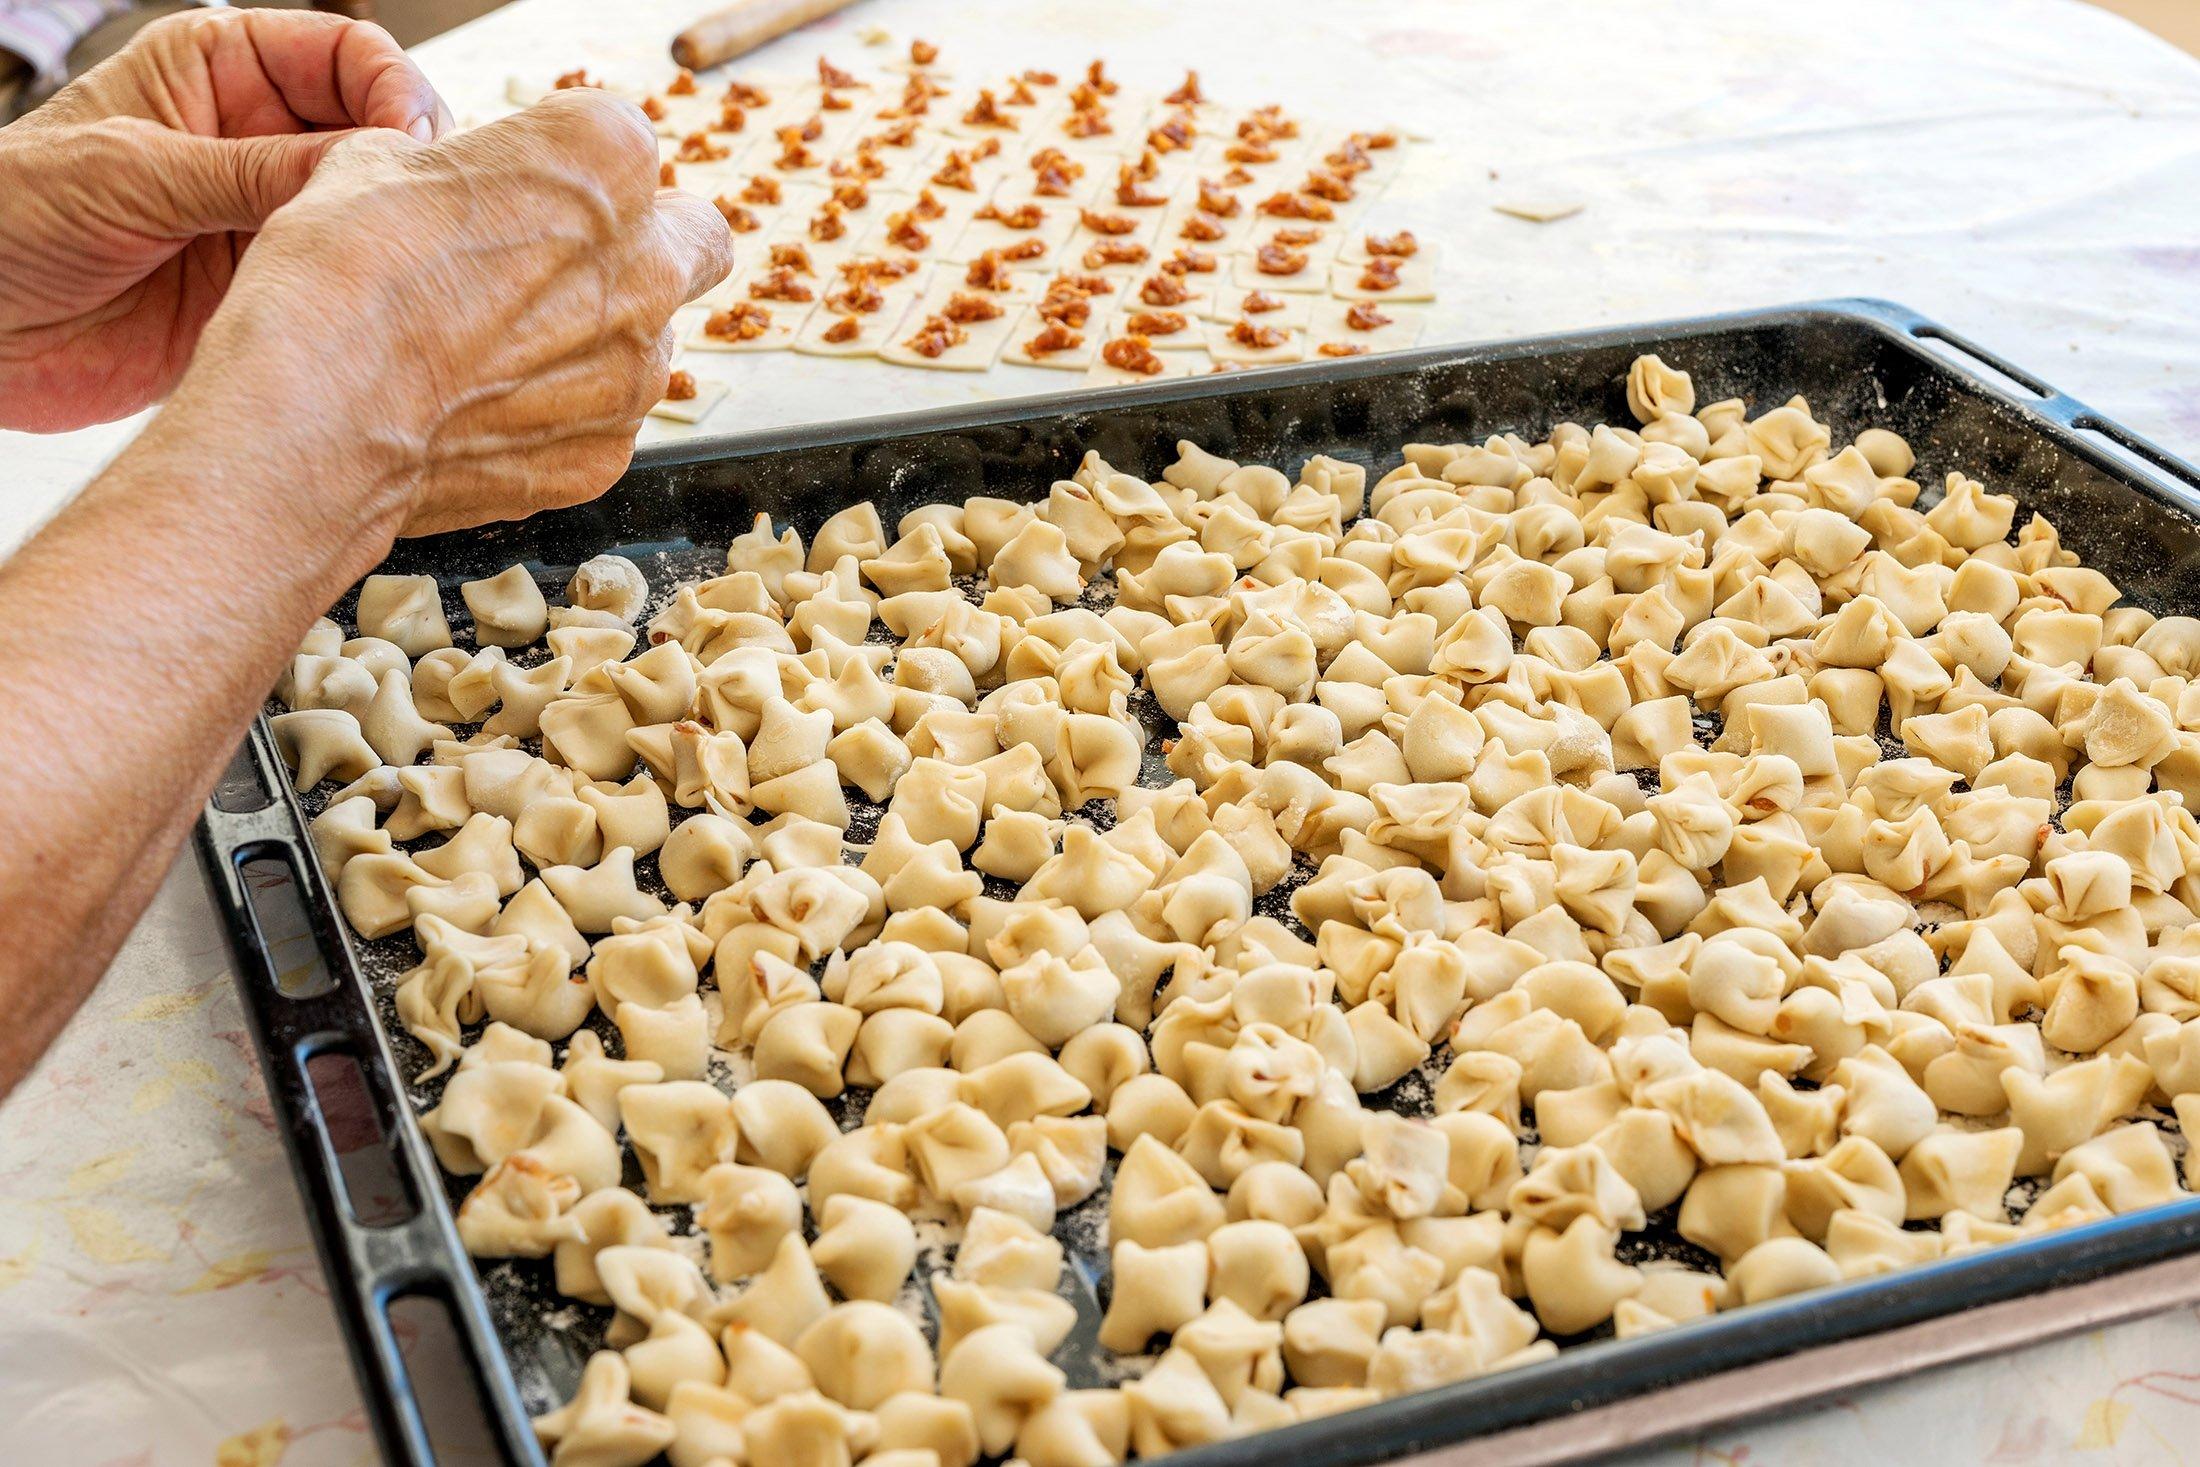 A woman makes Turkish mantı. (Shutterstock Photo)